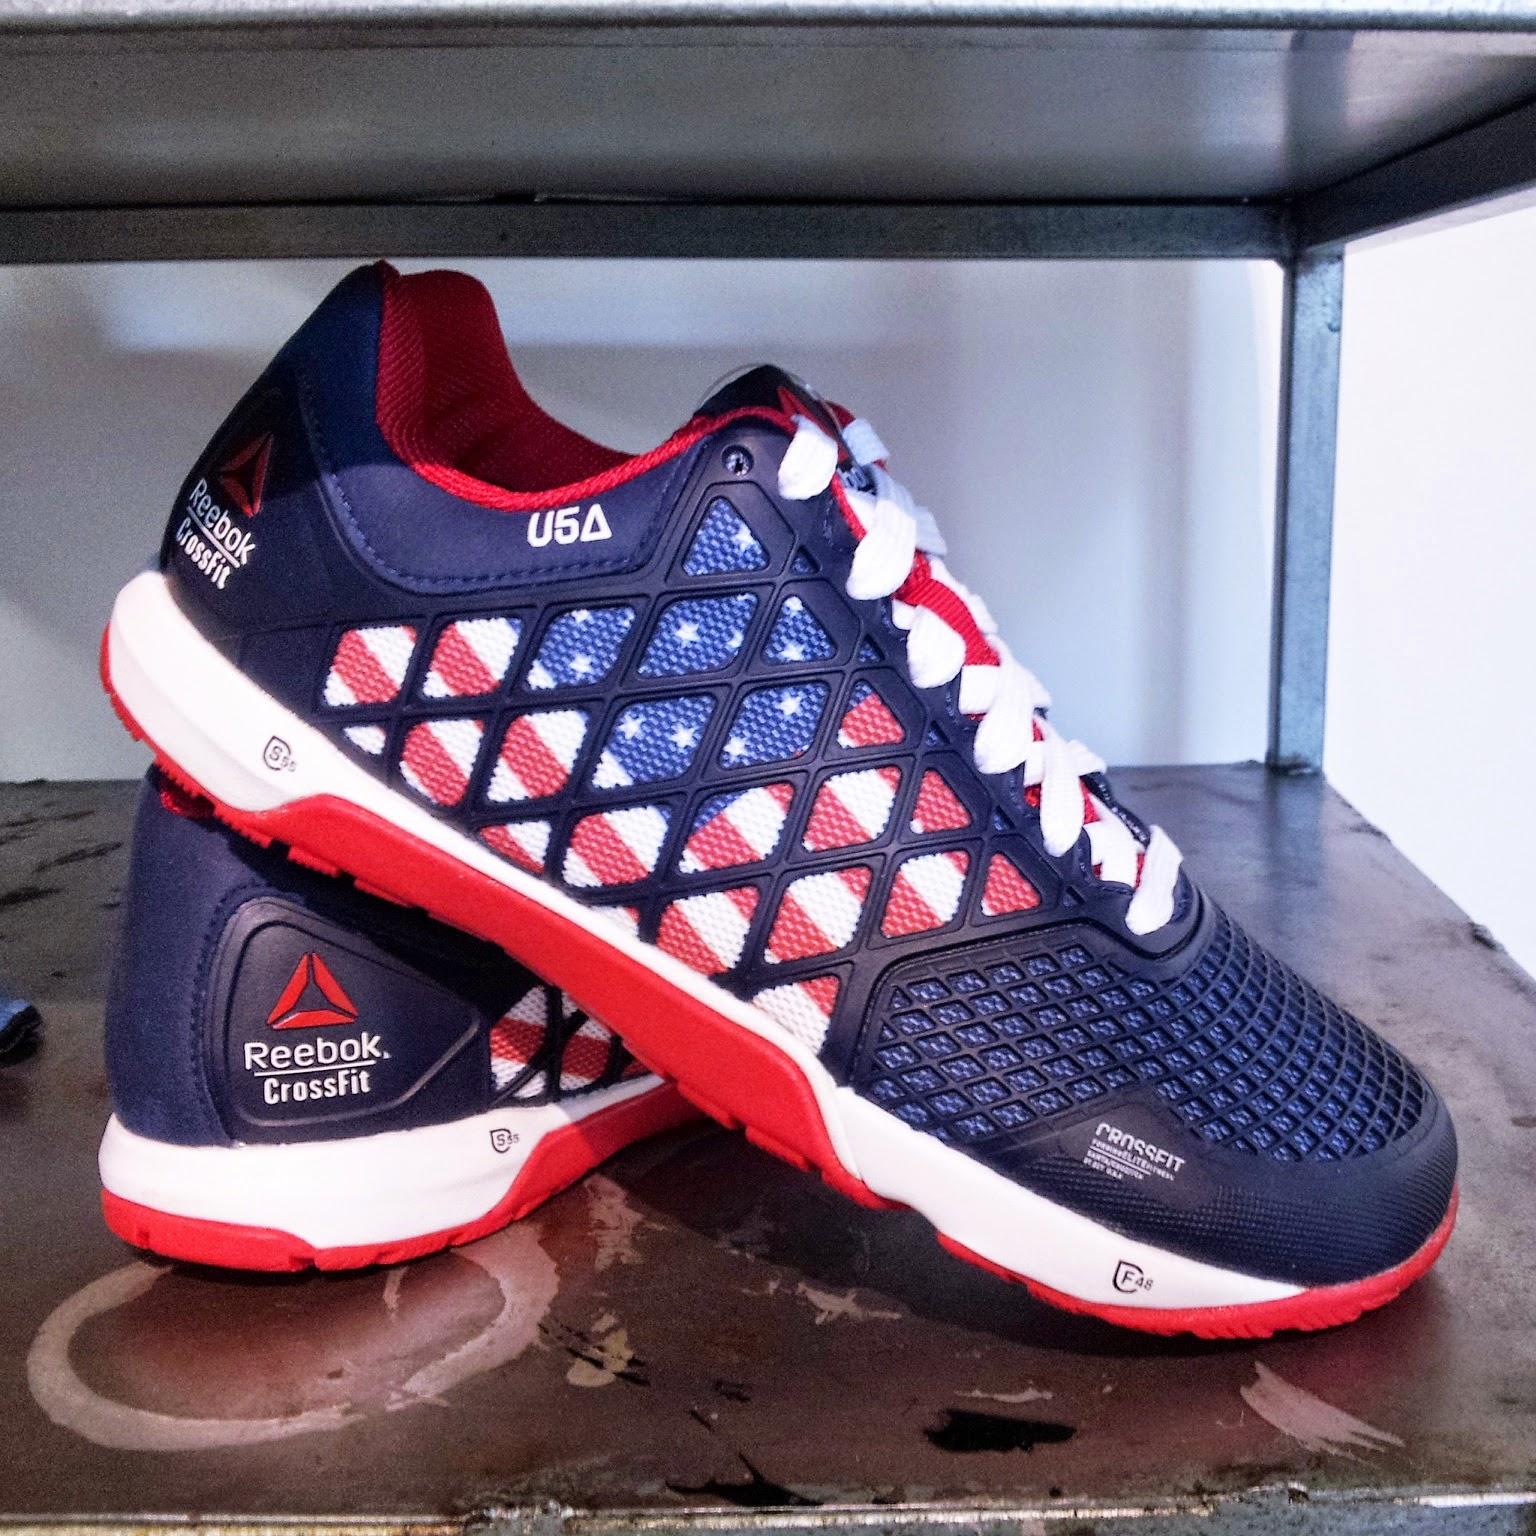 Cheap Reebok Shoes Nz